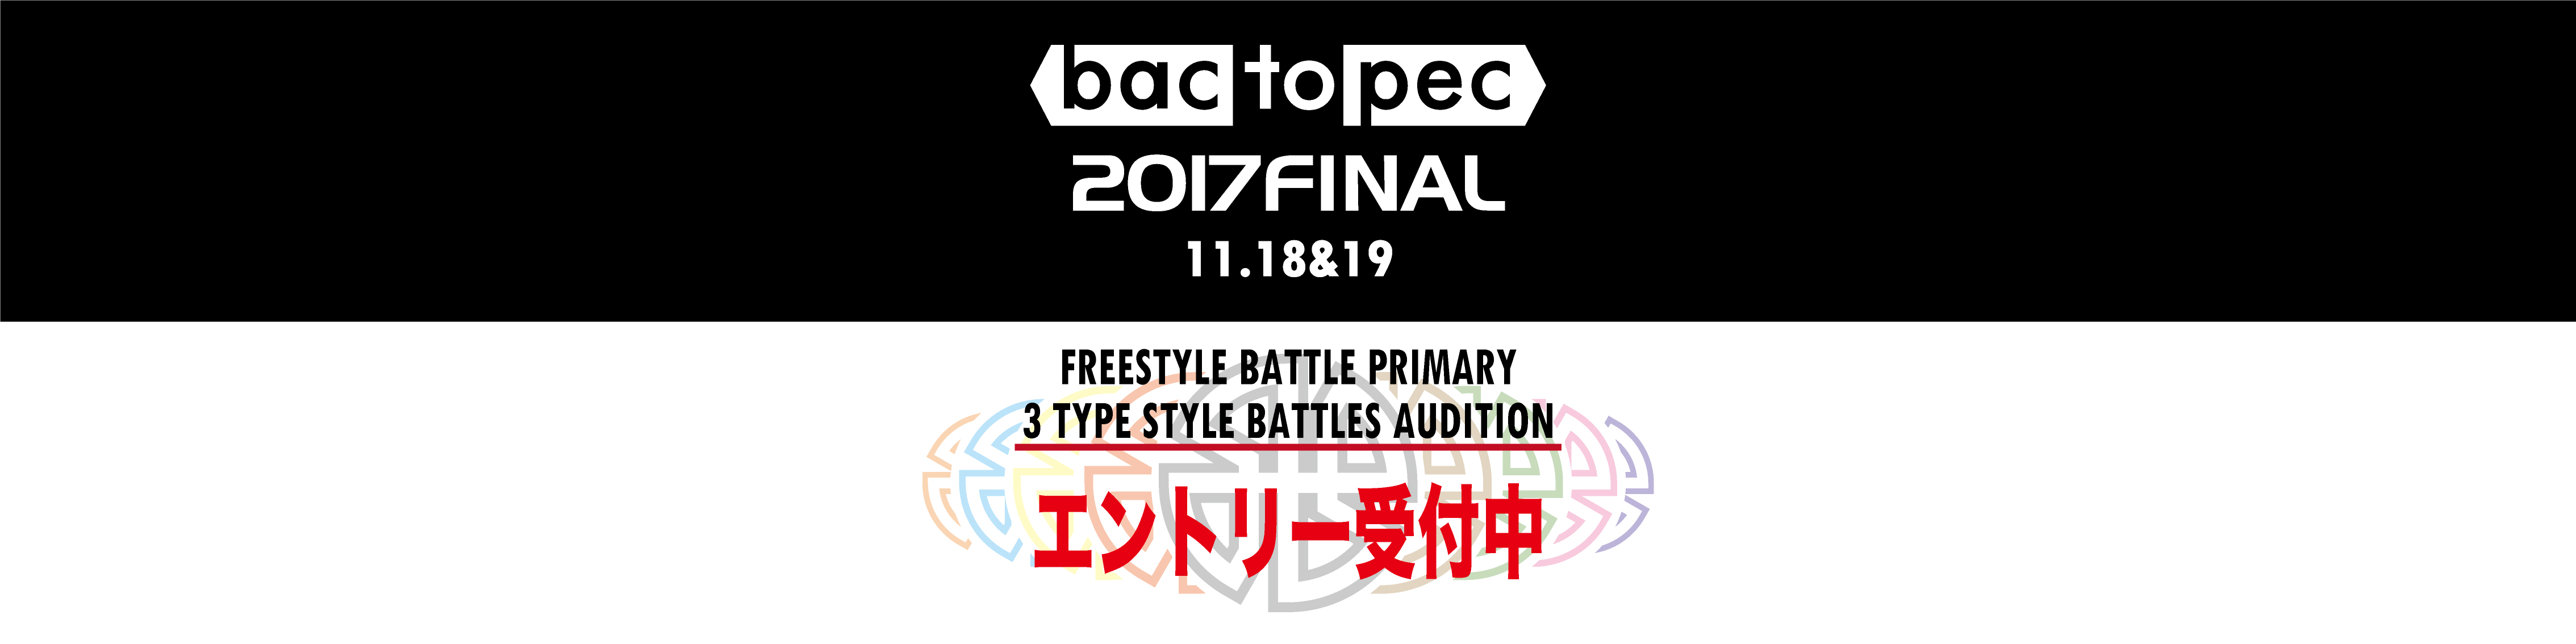 btp2017finalエントリー